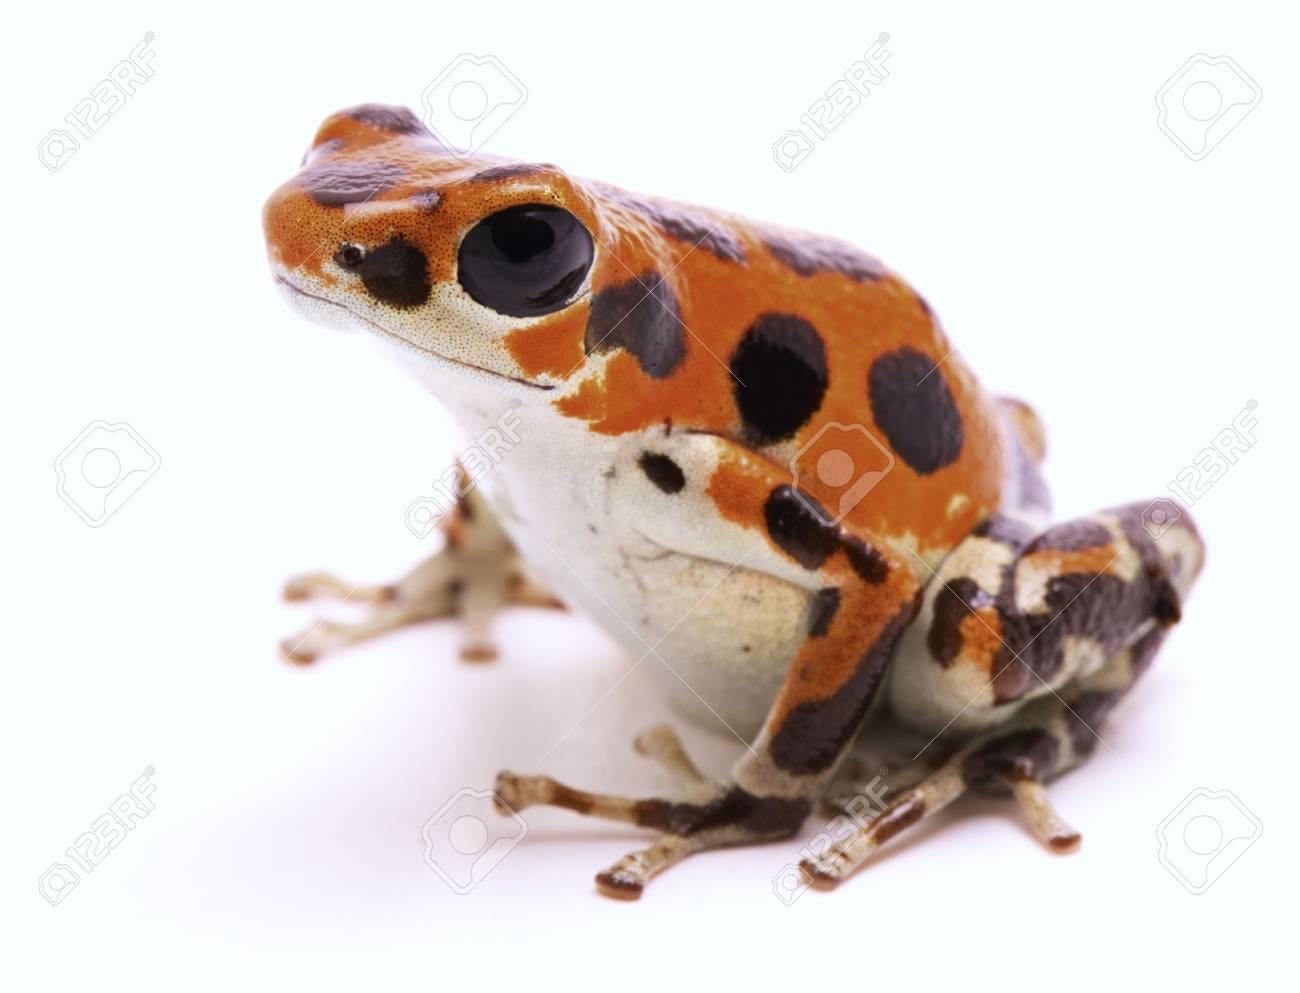 Image result for red frog